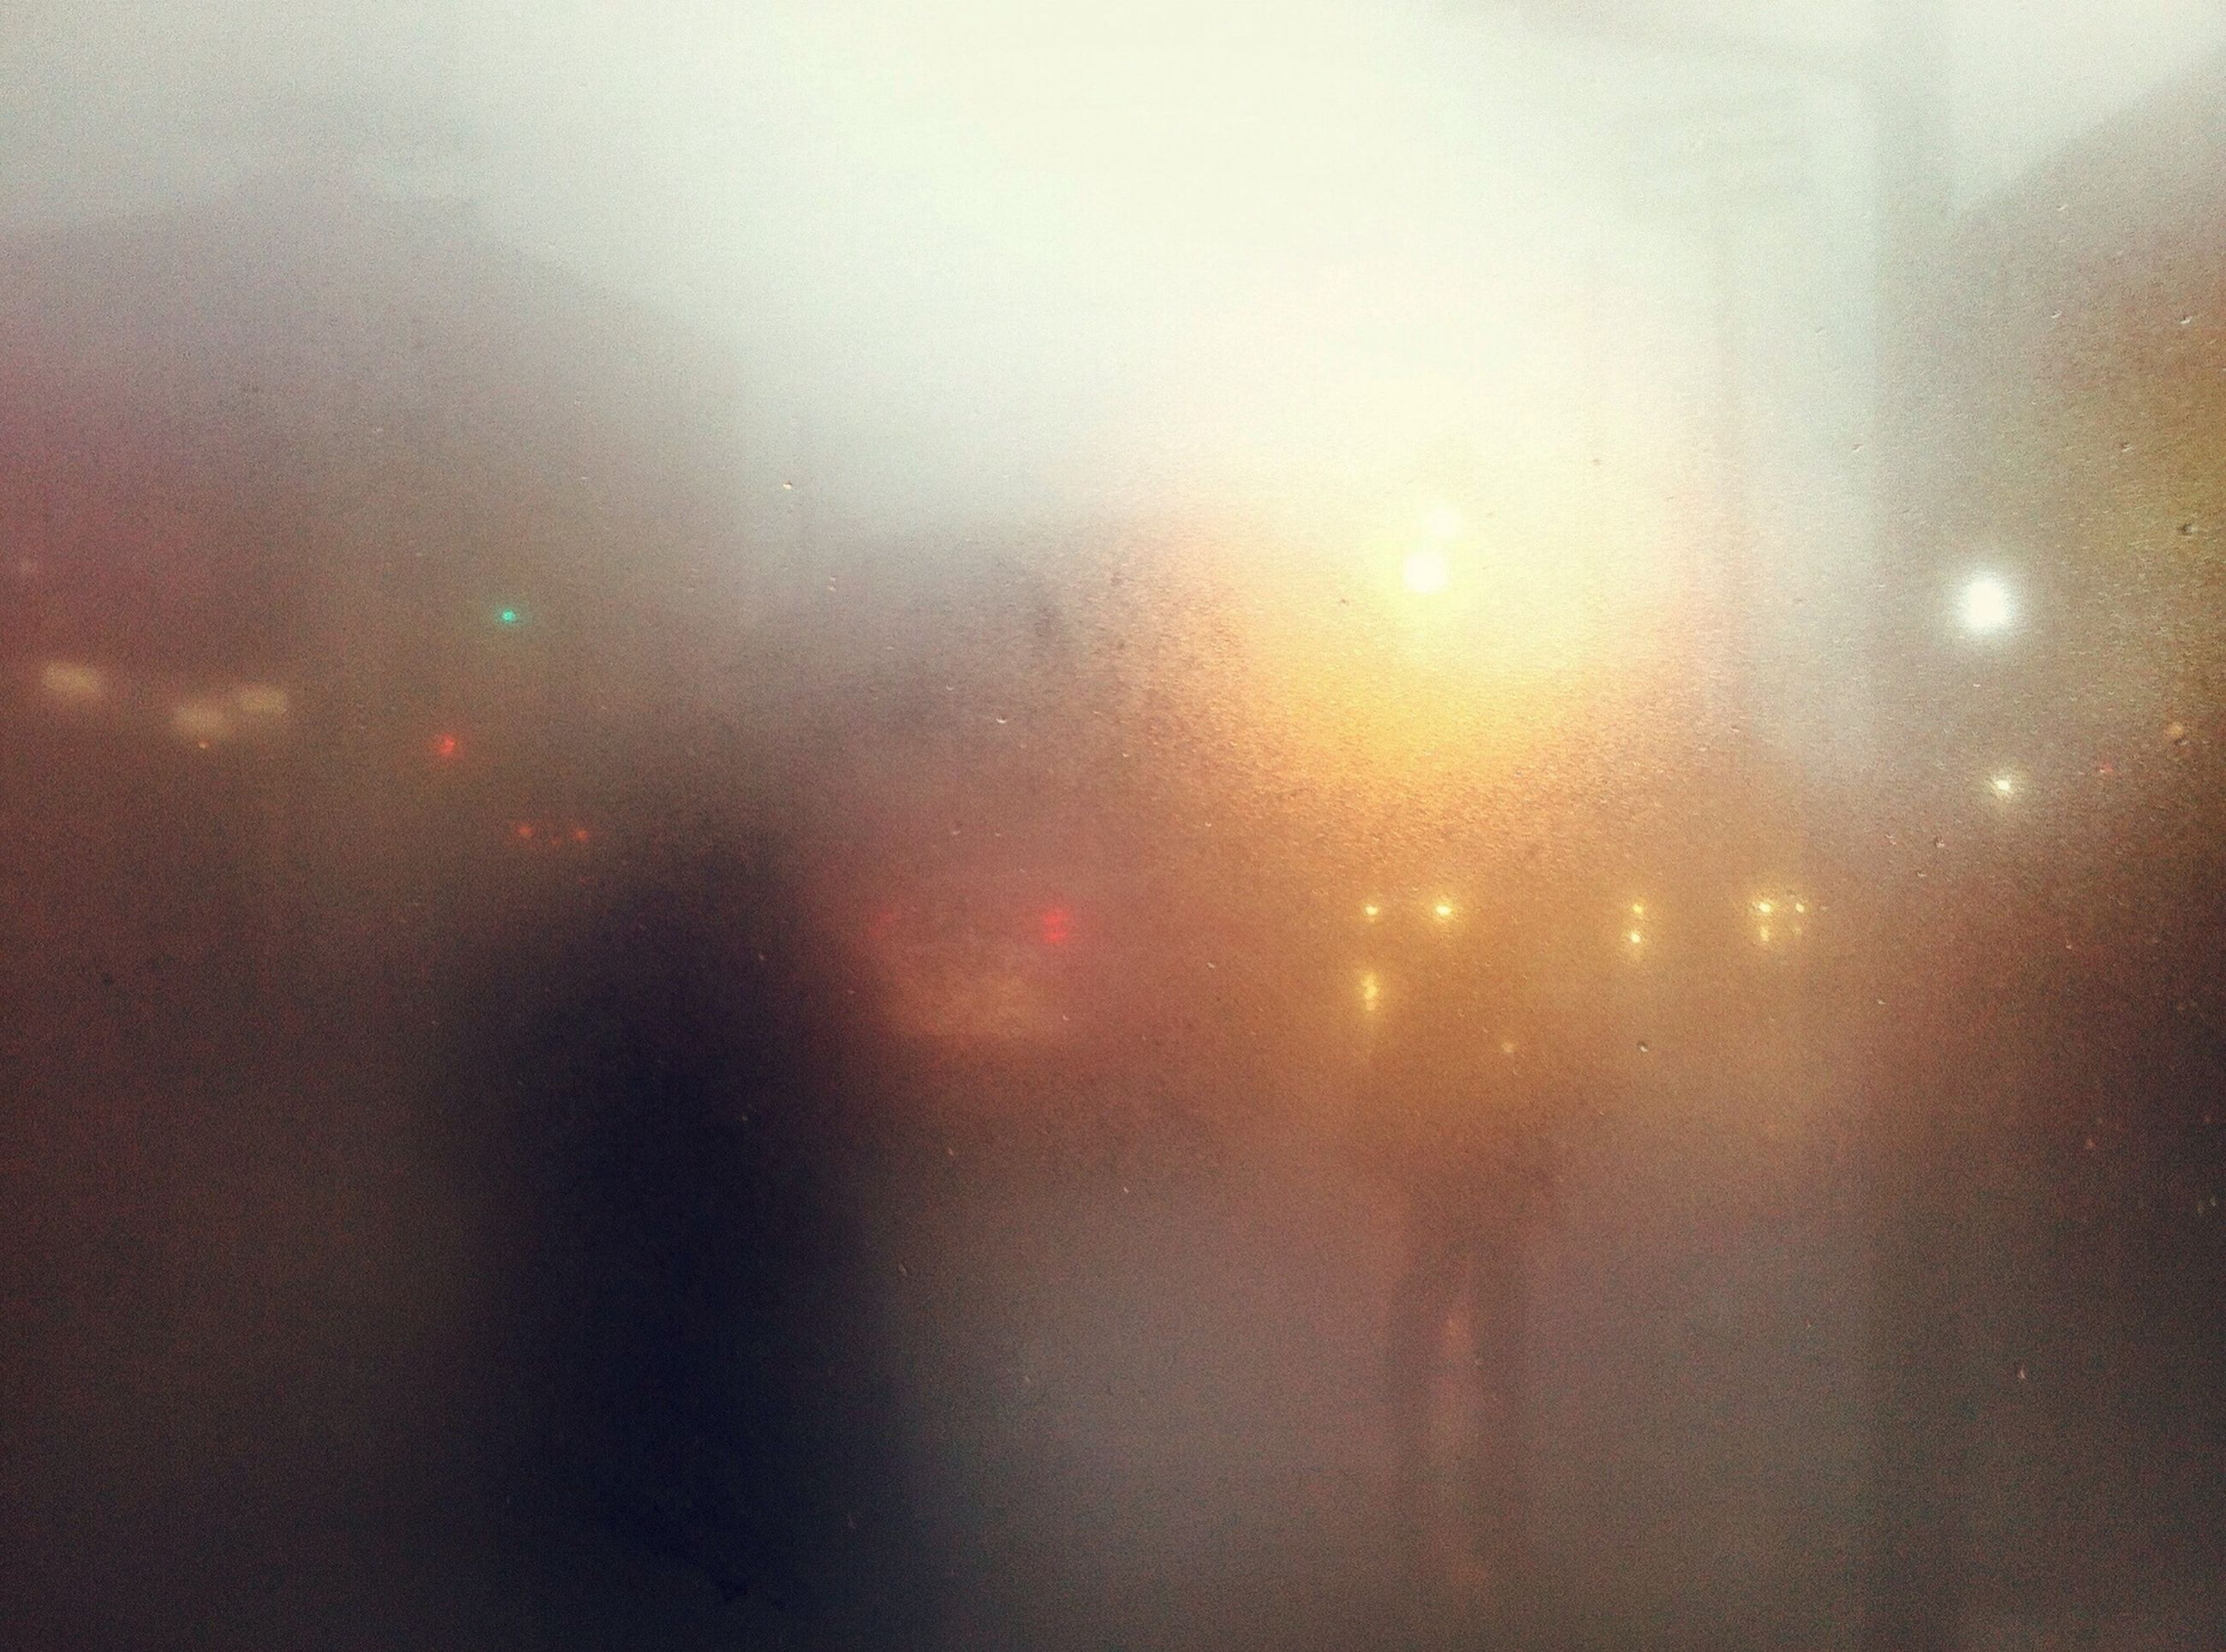 illuminated, rain, wet, weather, transparent, defocused, glass - material, window, night, drop, indoors, fog, sky, lighting equipment, no people, water, backgrounds, street light, season, dusk